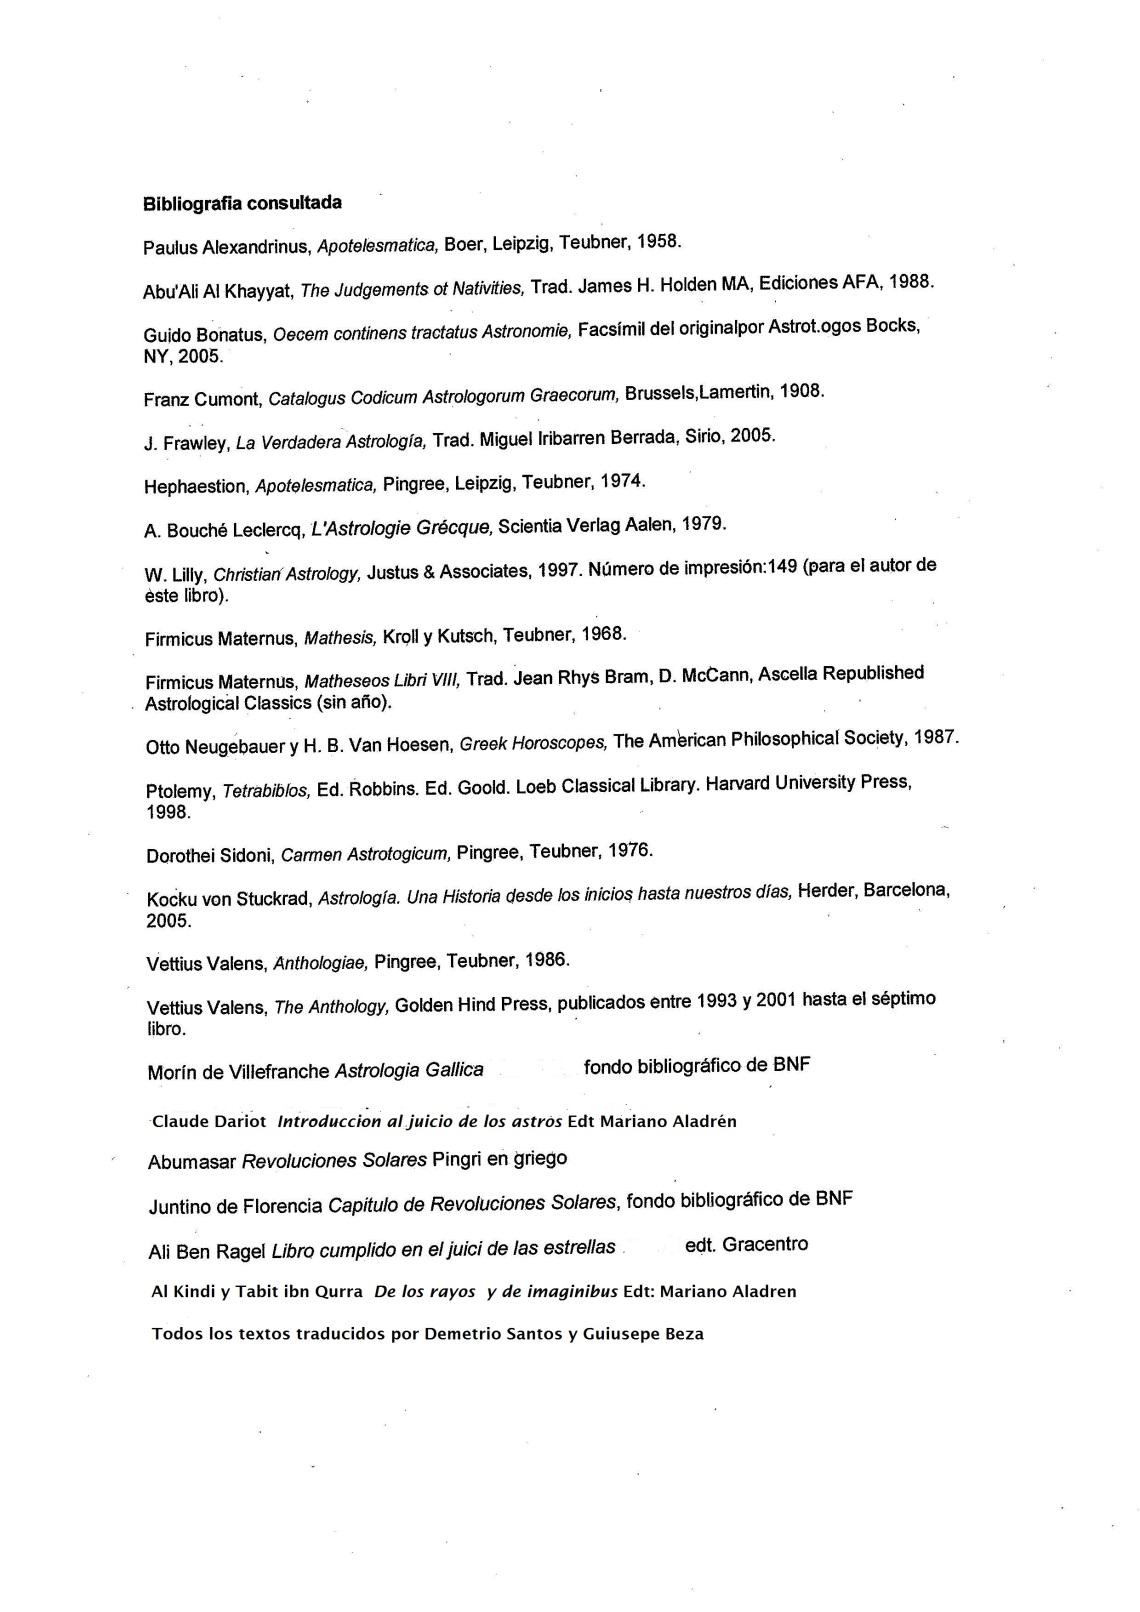 bibliografiaastrrologiaclasica